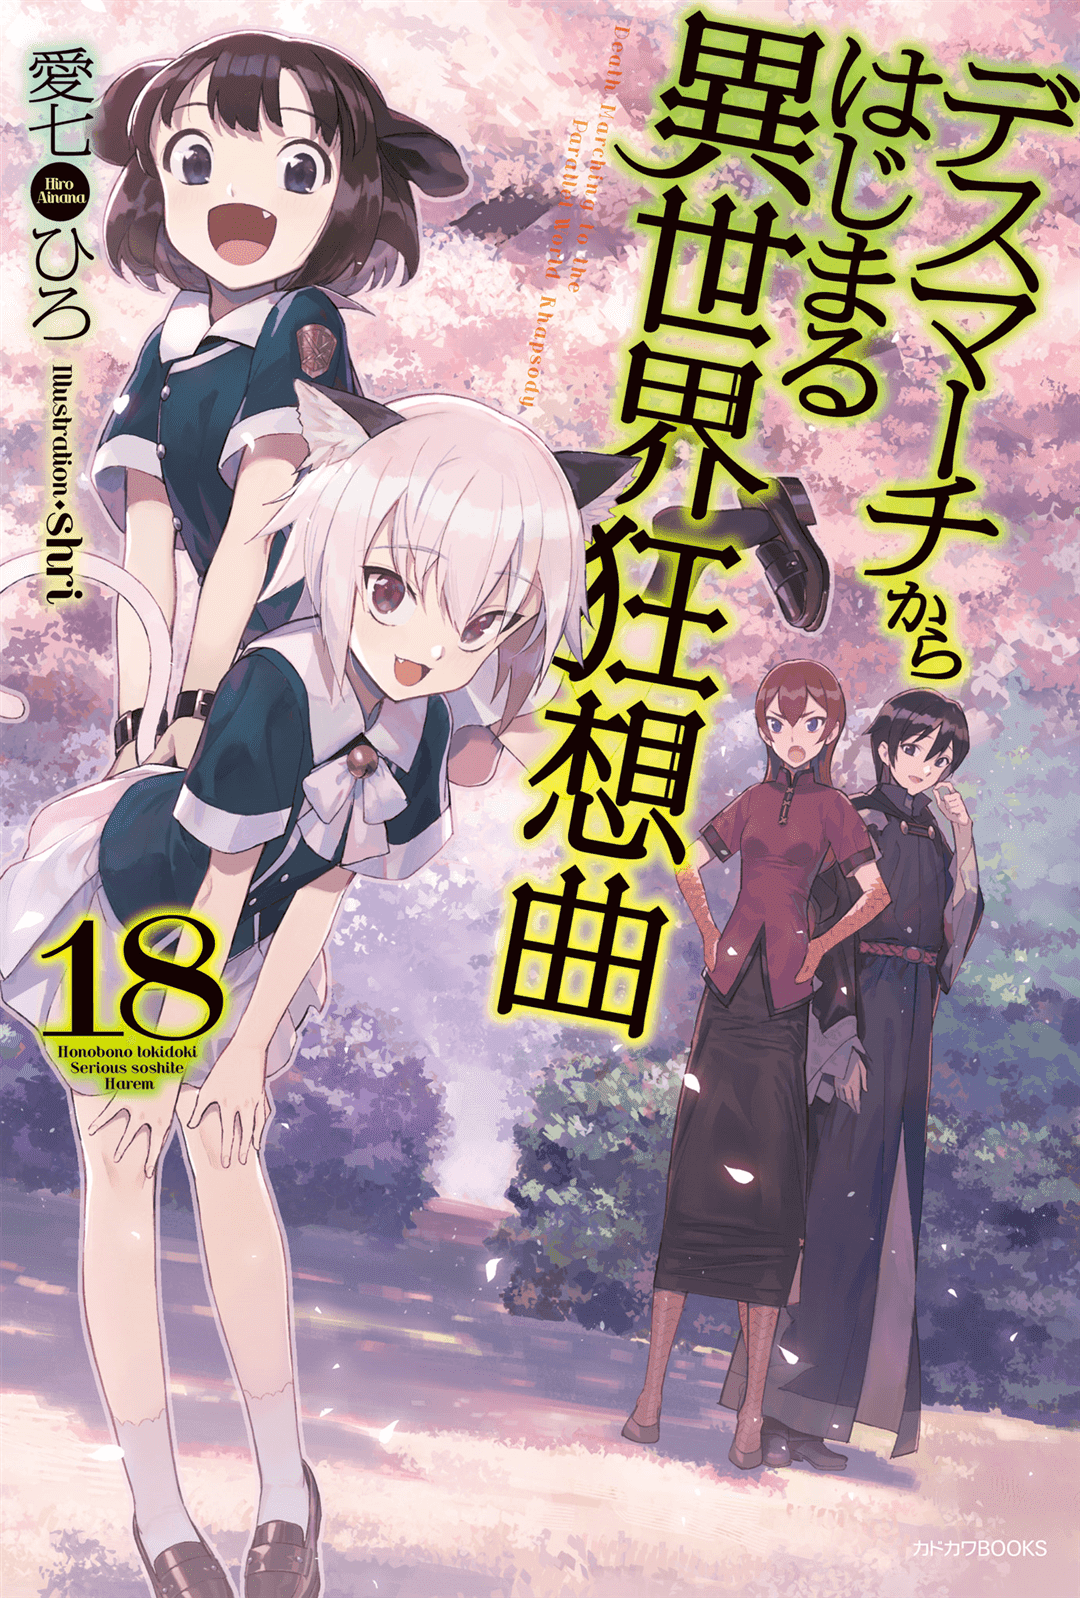 Death March Kara Hajimaru Isekai Kyousoukyoku / Death March to the Parallel World Rhapsody Light Novel Online Volume 18